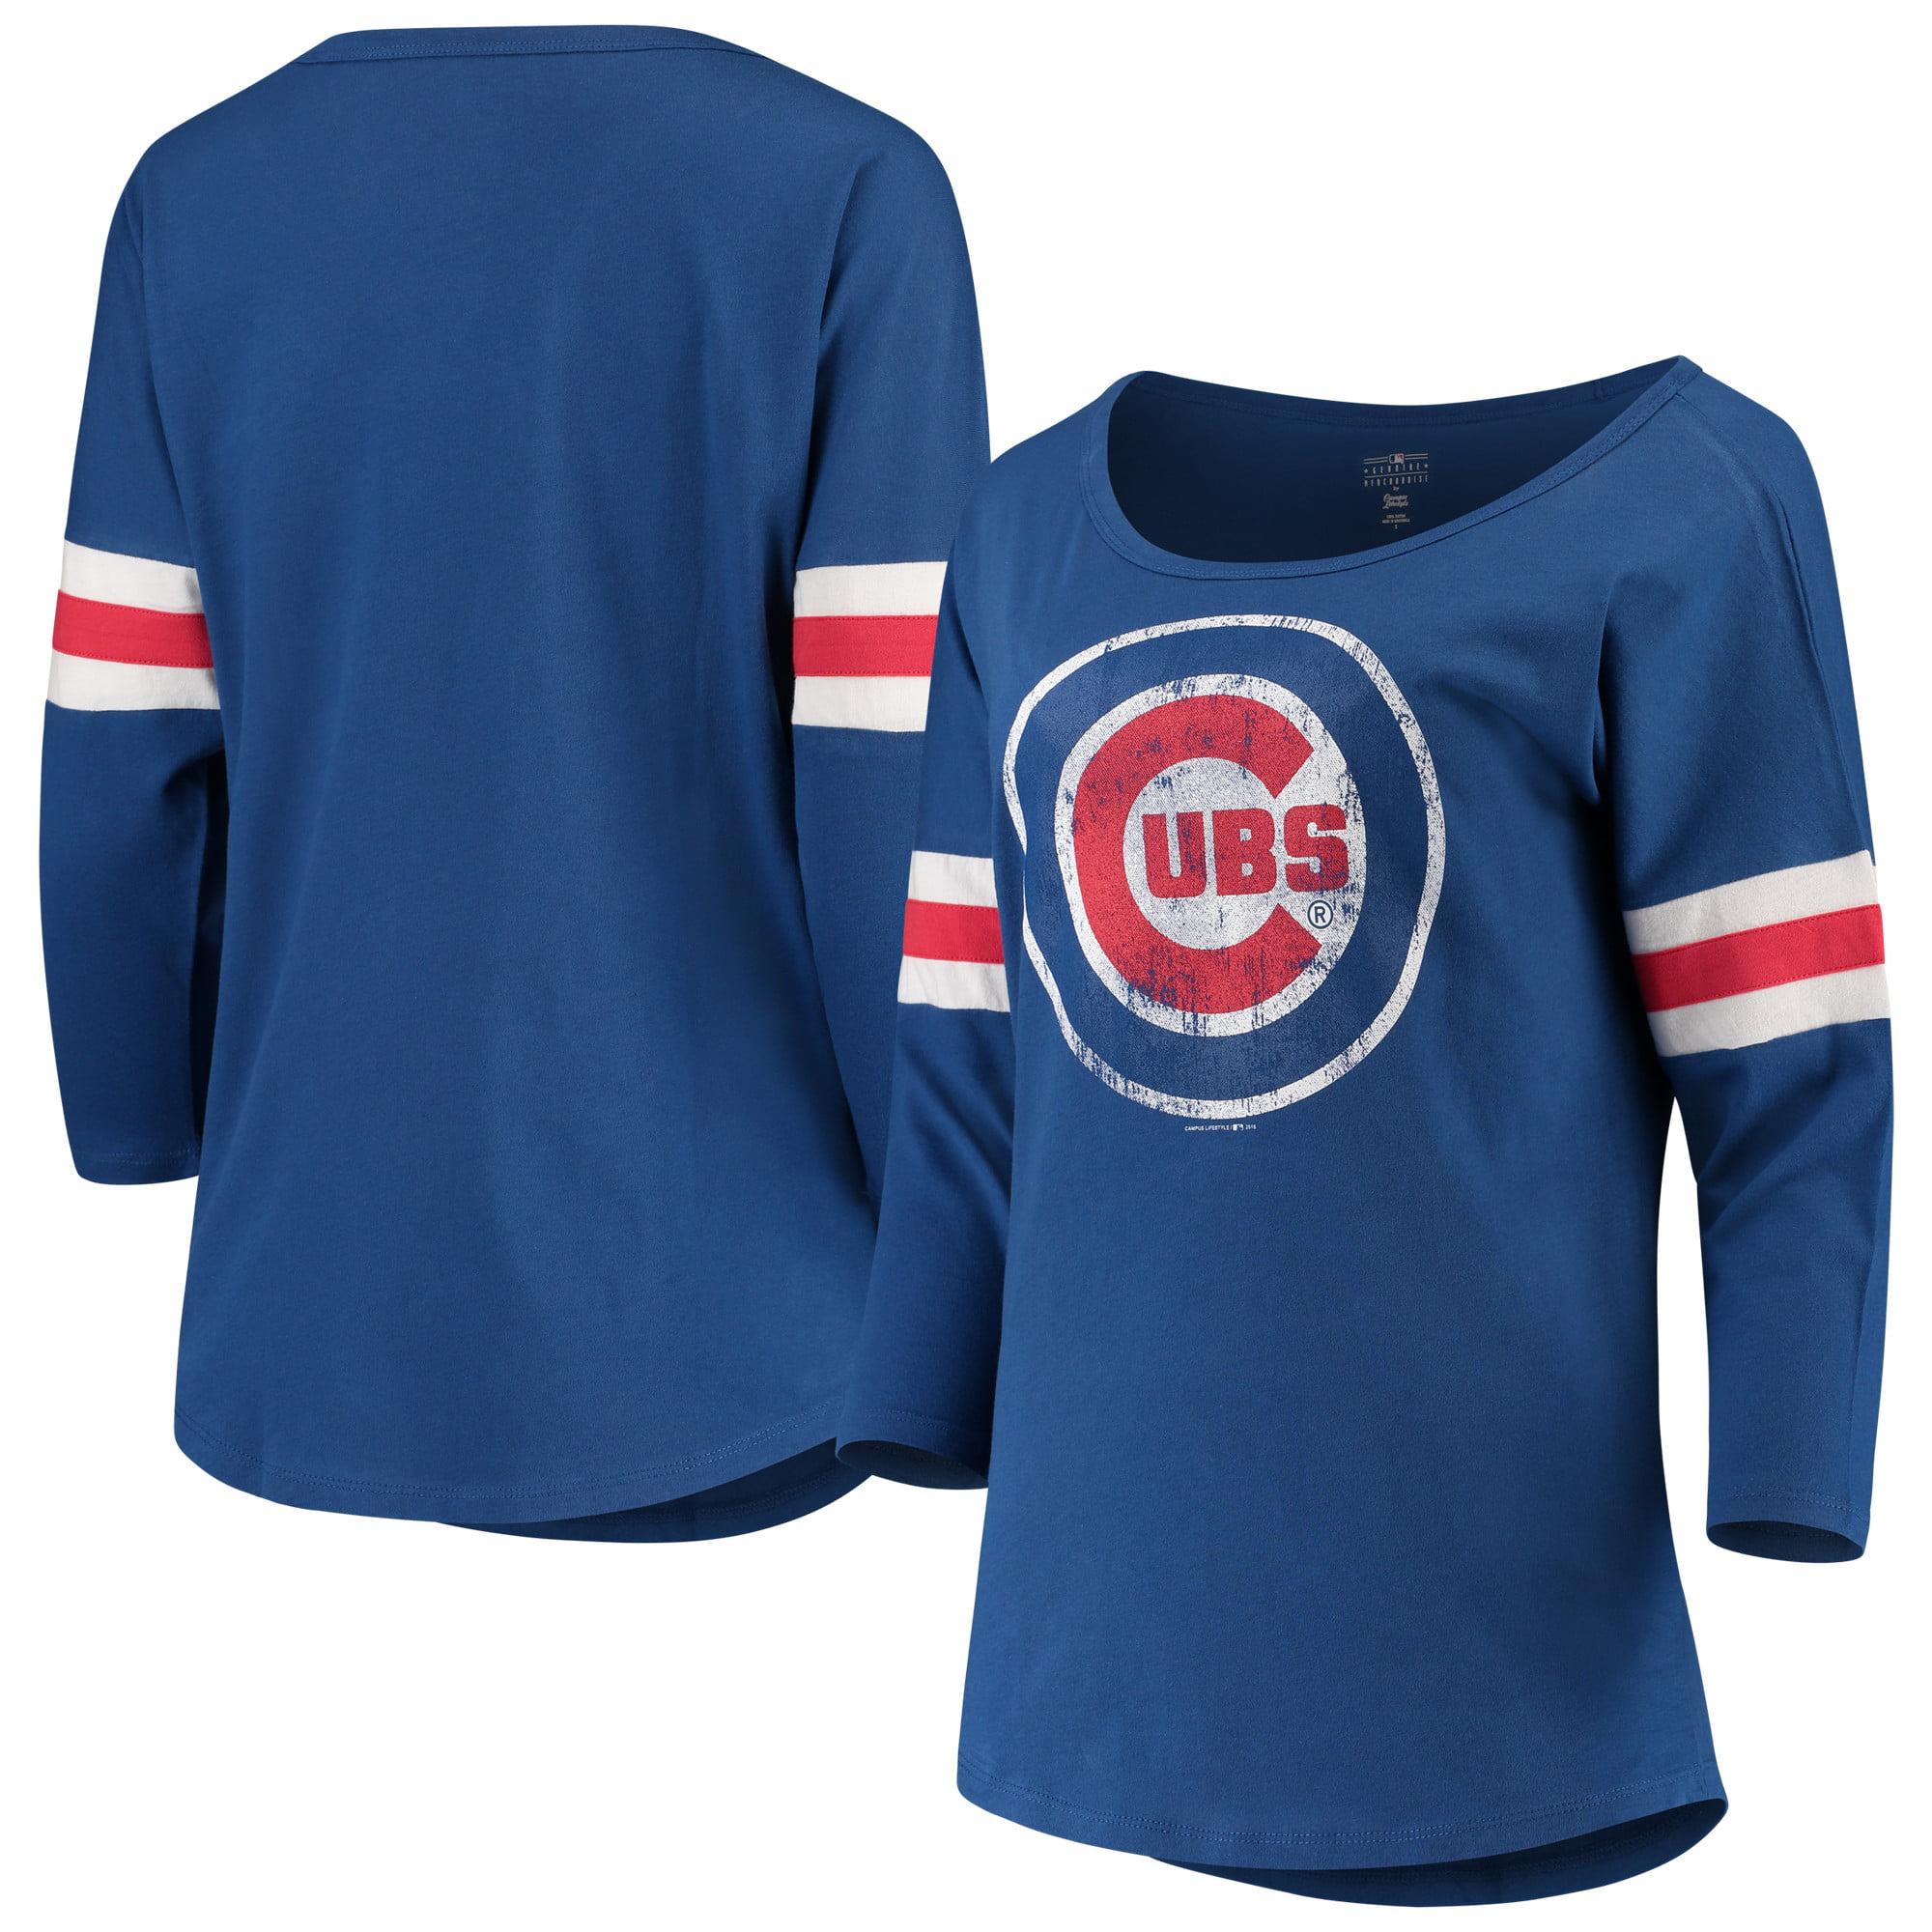 Women's New Era Royal Chicago Cubs Scoop Neck 3/4-Sleeve T-Shirt